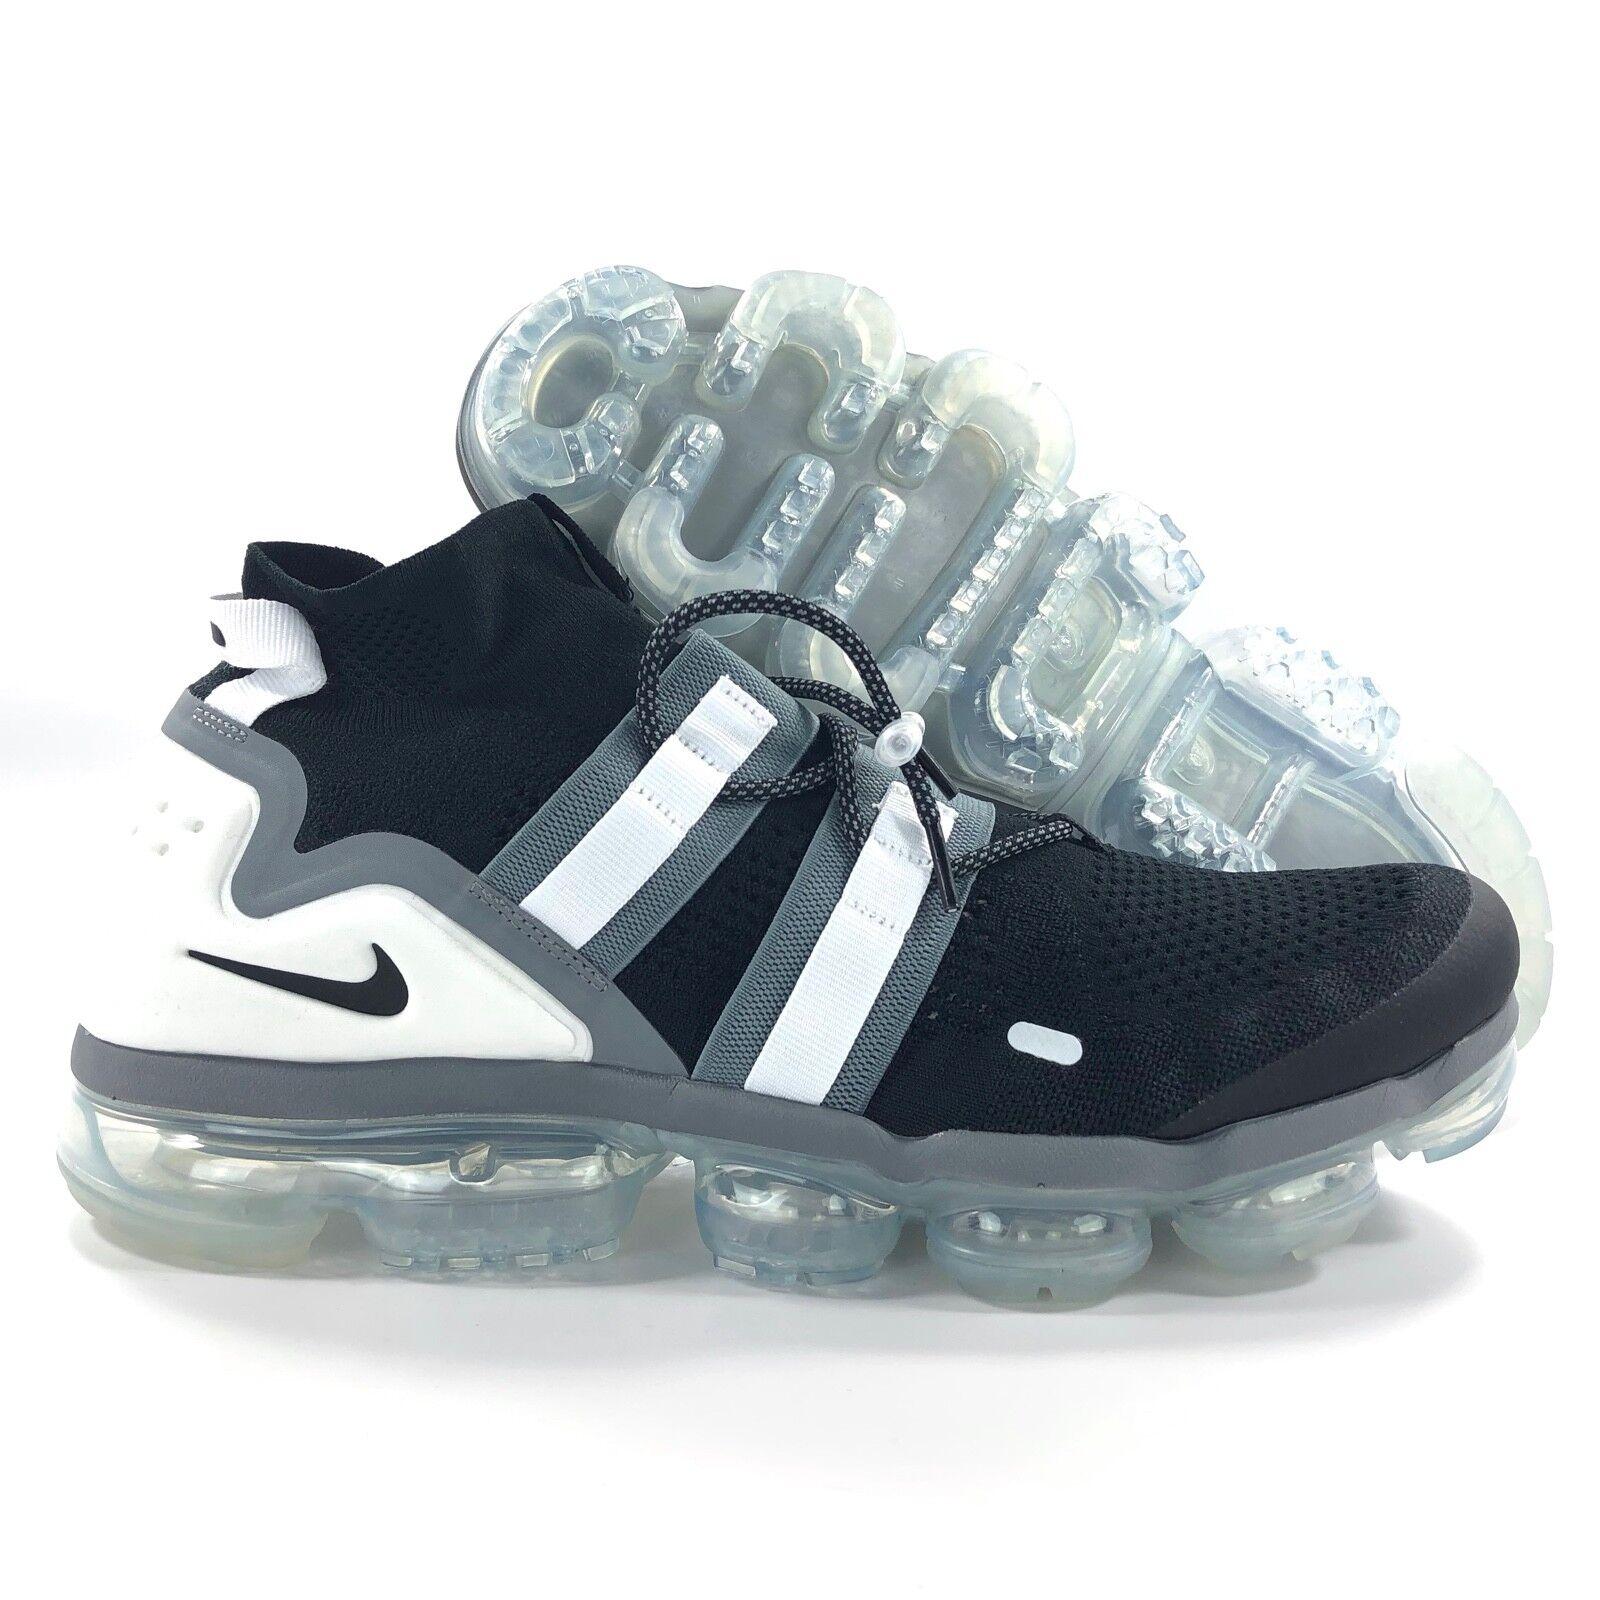 ce52ac9507b1 Nike Air Vapormax FK Flyknit Utility Black Grey White AH6834-003 AH6834-003  AH6834